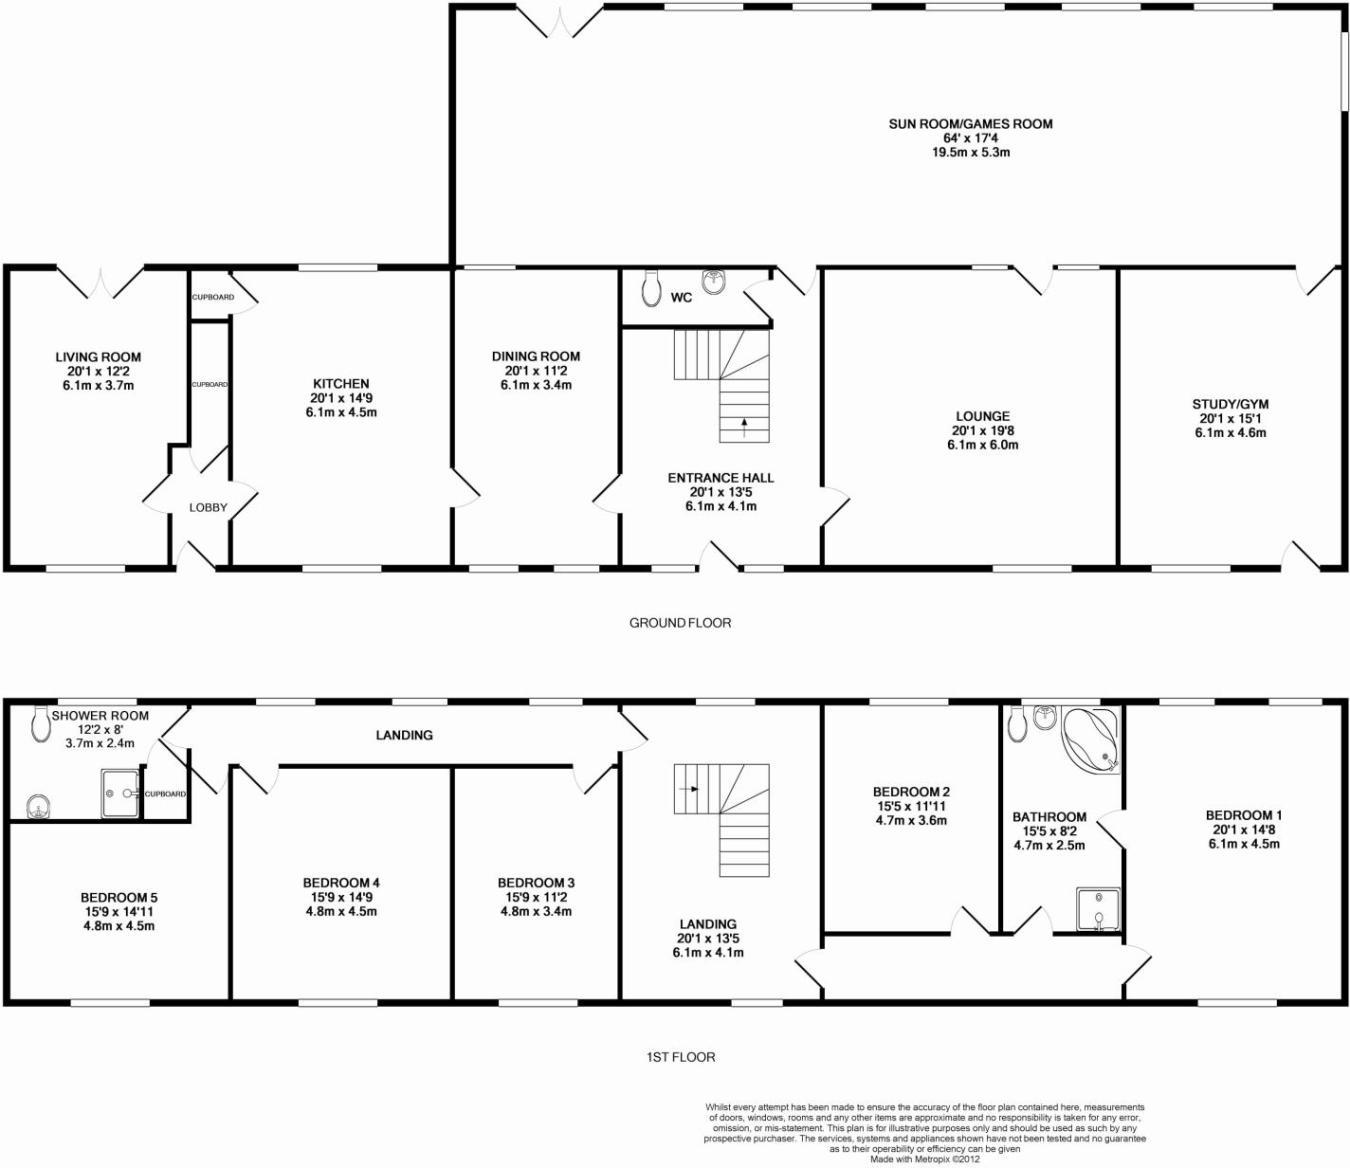 Russell Senate Office Building Floor Plan Photo Piggery Floor Plan Design Images 100 Piggery